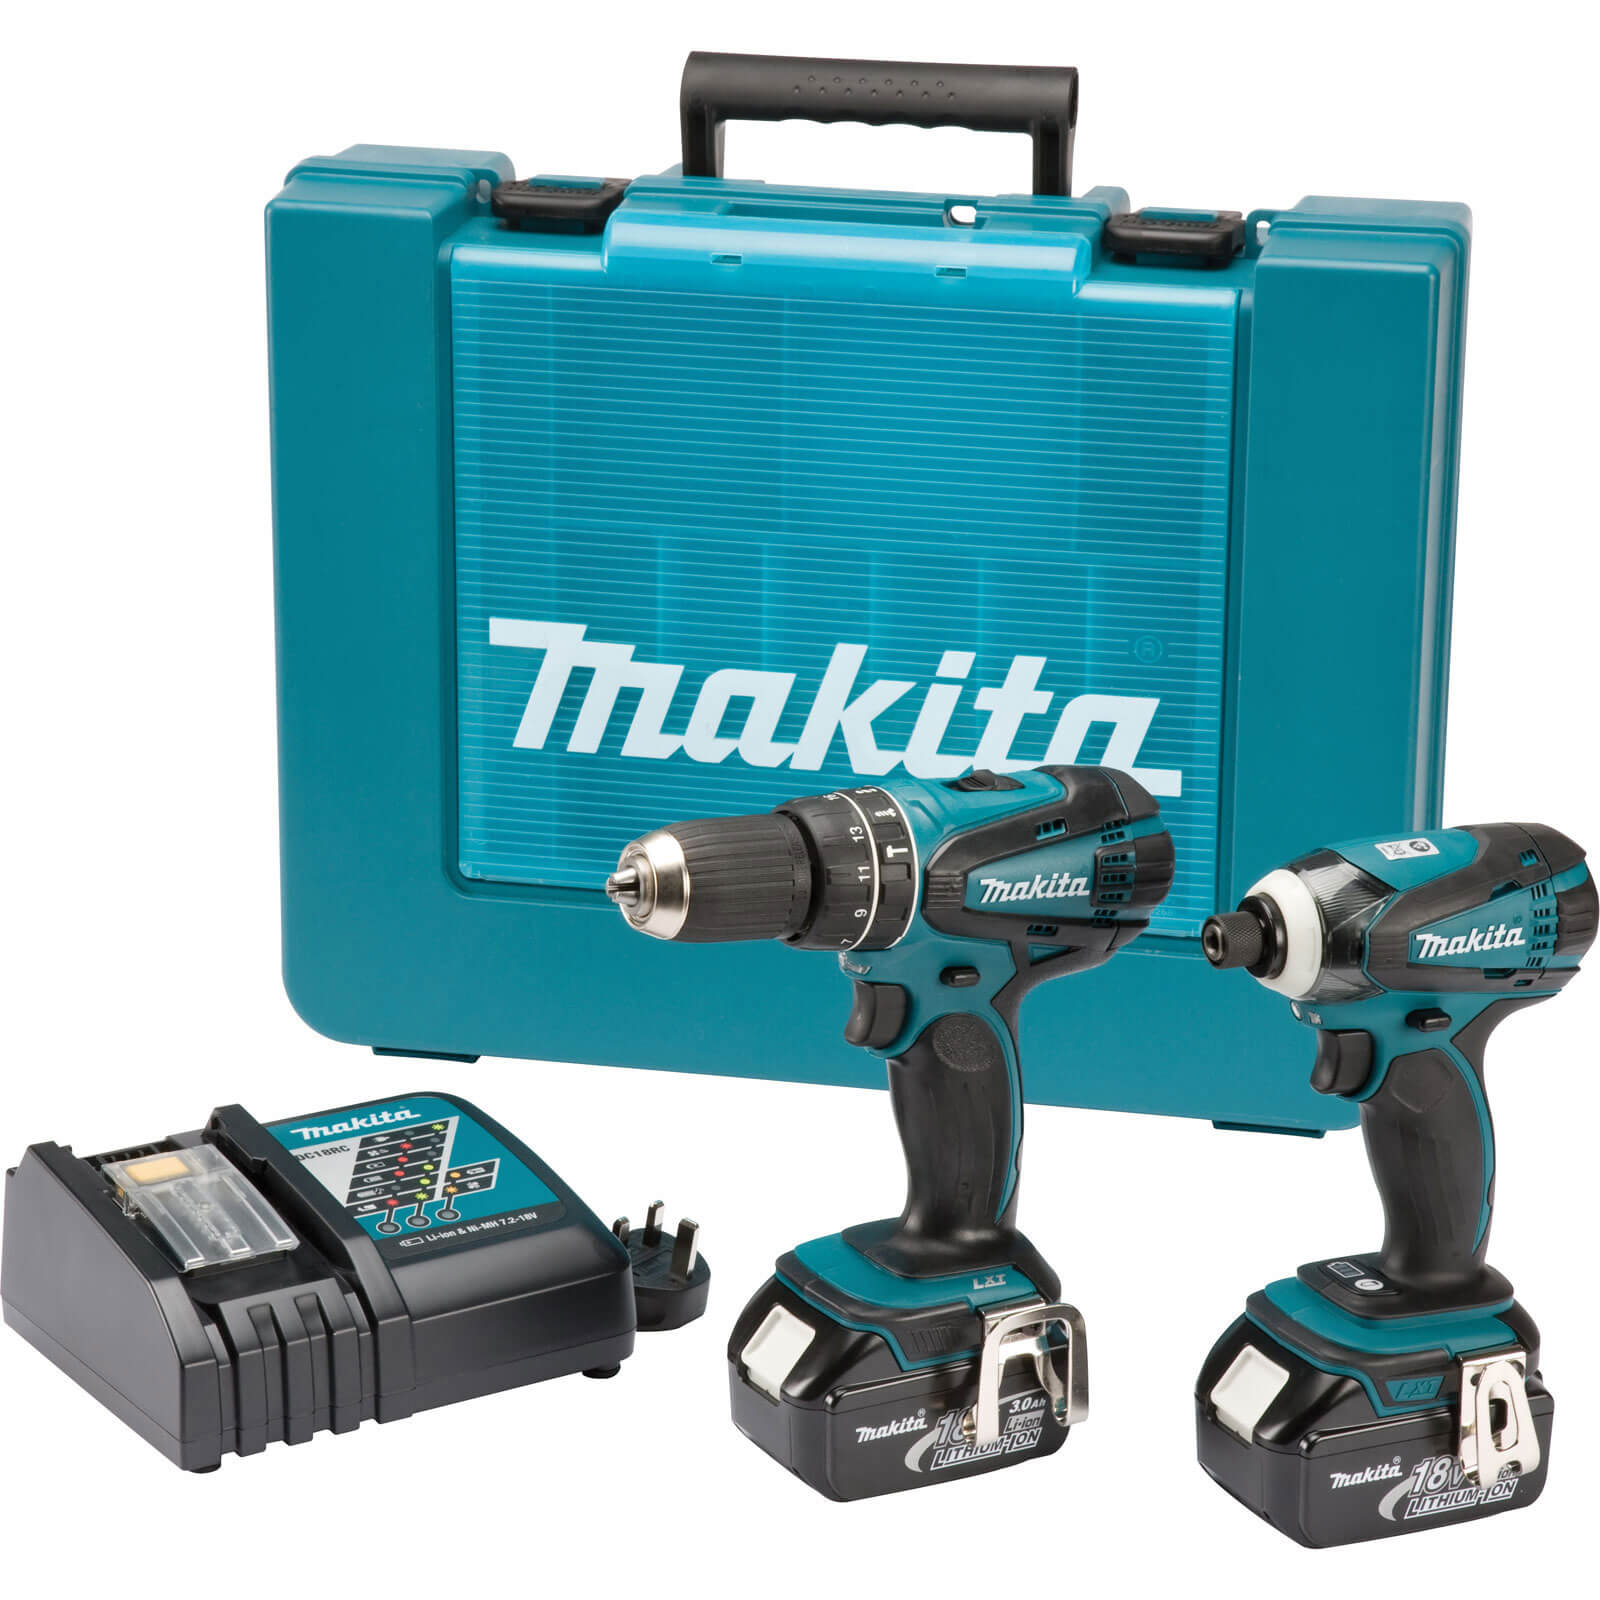 Image of Makita DLX2012 18v Cordless LXT Combi Drill & Impact Driver Kit 2 x 3ah Li-ion Charger Case